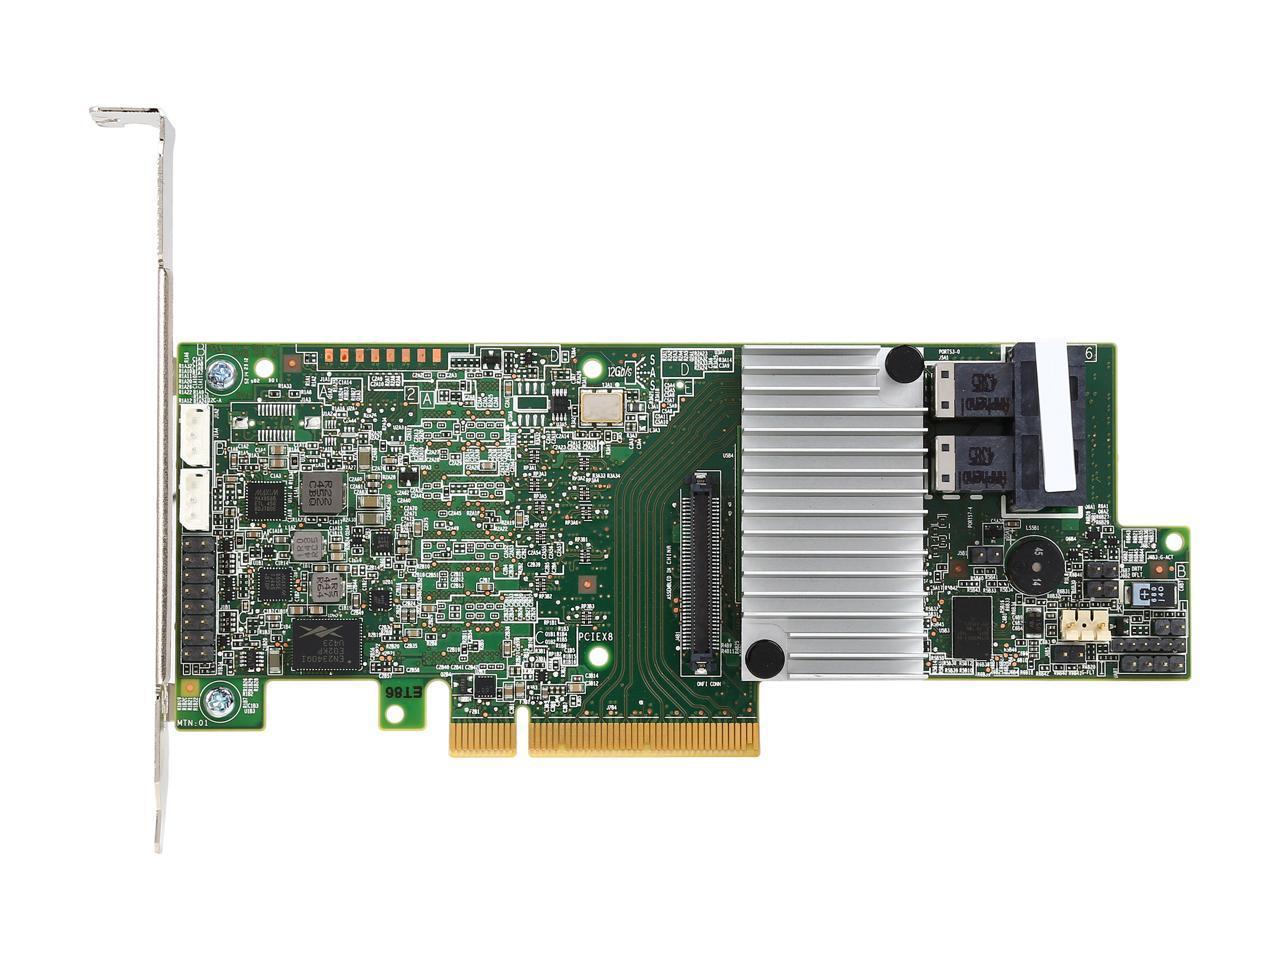 In Card Pci Express 3.0 X8 Intel Raid Controller Rs3sc008 12Gb//S Sas 1 Raid Supported 10 8 Sas Port Product Type: I//O /& Storage Controllers//Scsi//Raid Controllers 5 50 6 Raid Level Plug S 60